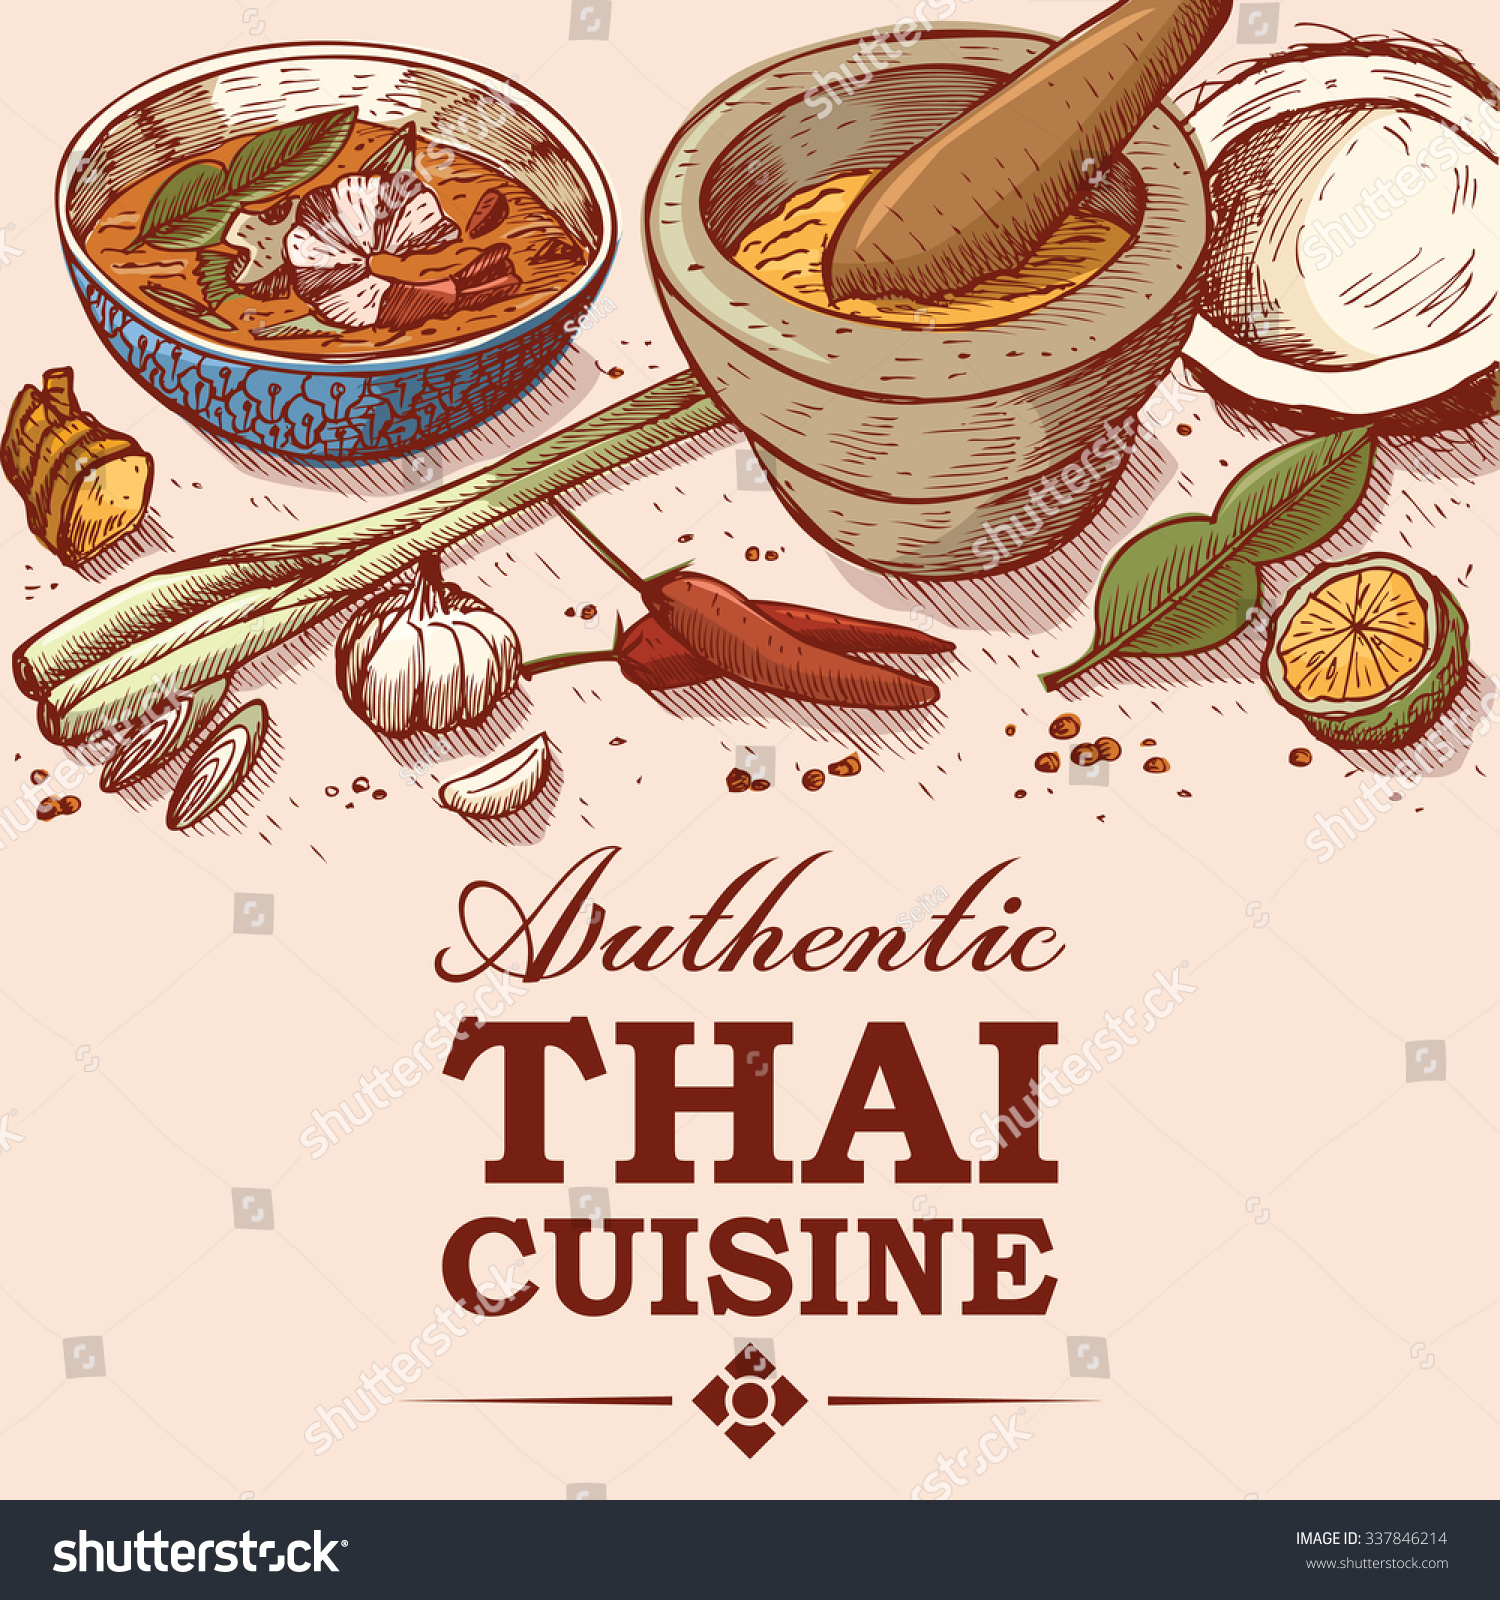 Hand drawn illustration thai food ingredients vectores en stock hand drawn illustration thai food ingredients vectores en stock 337846214 shutterstock forumfinder Choice Image